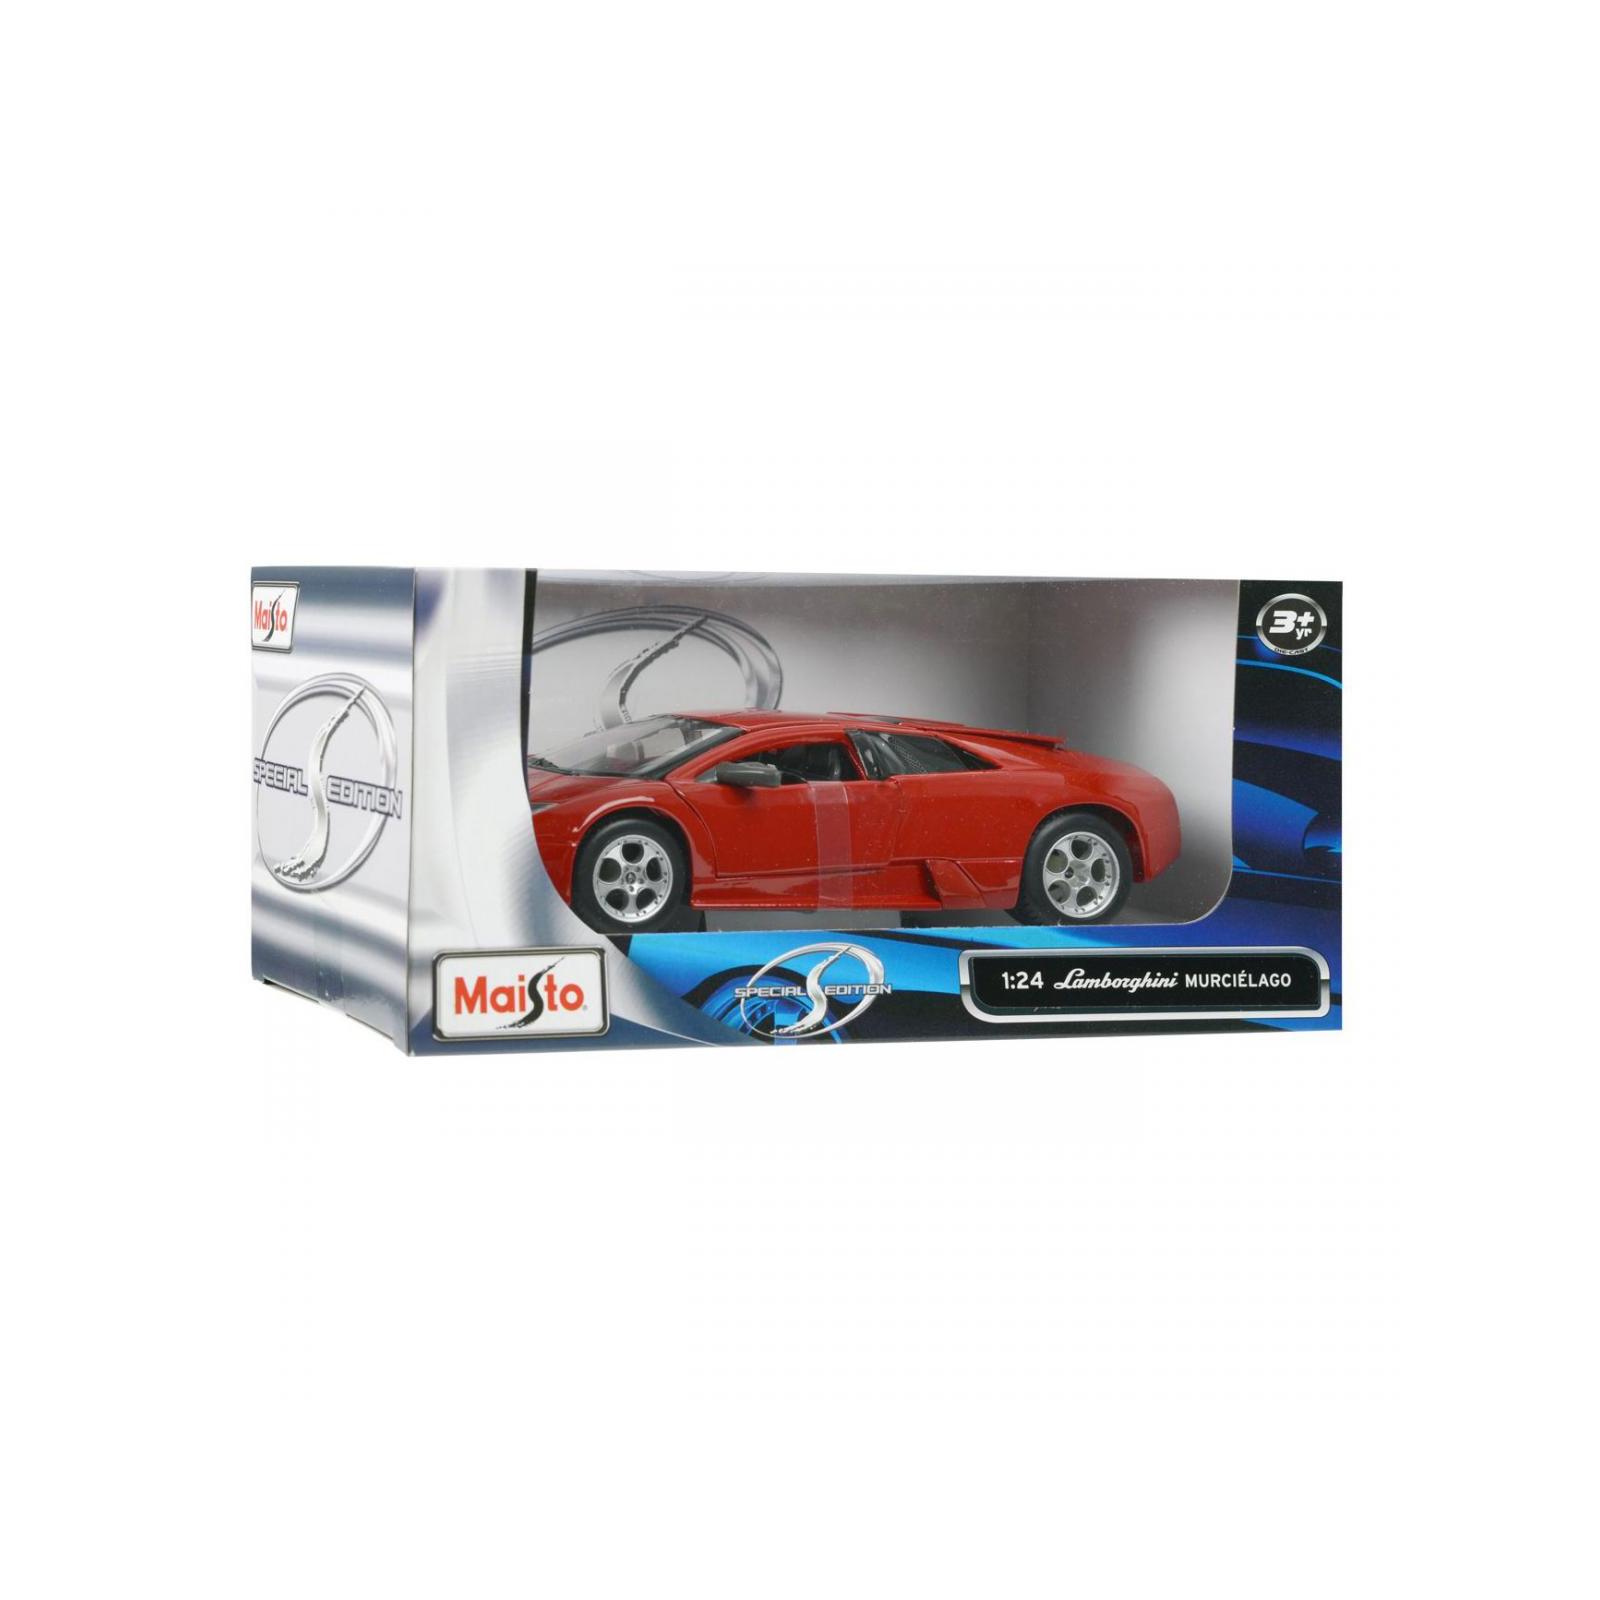 Машина Maisto Lamborghini Murcielago (1:24) красный металлик (31238 red) изображение 5